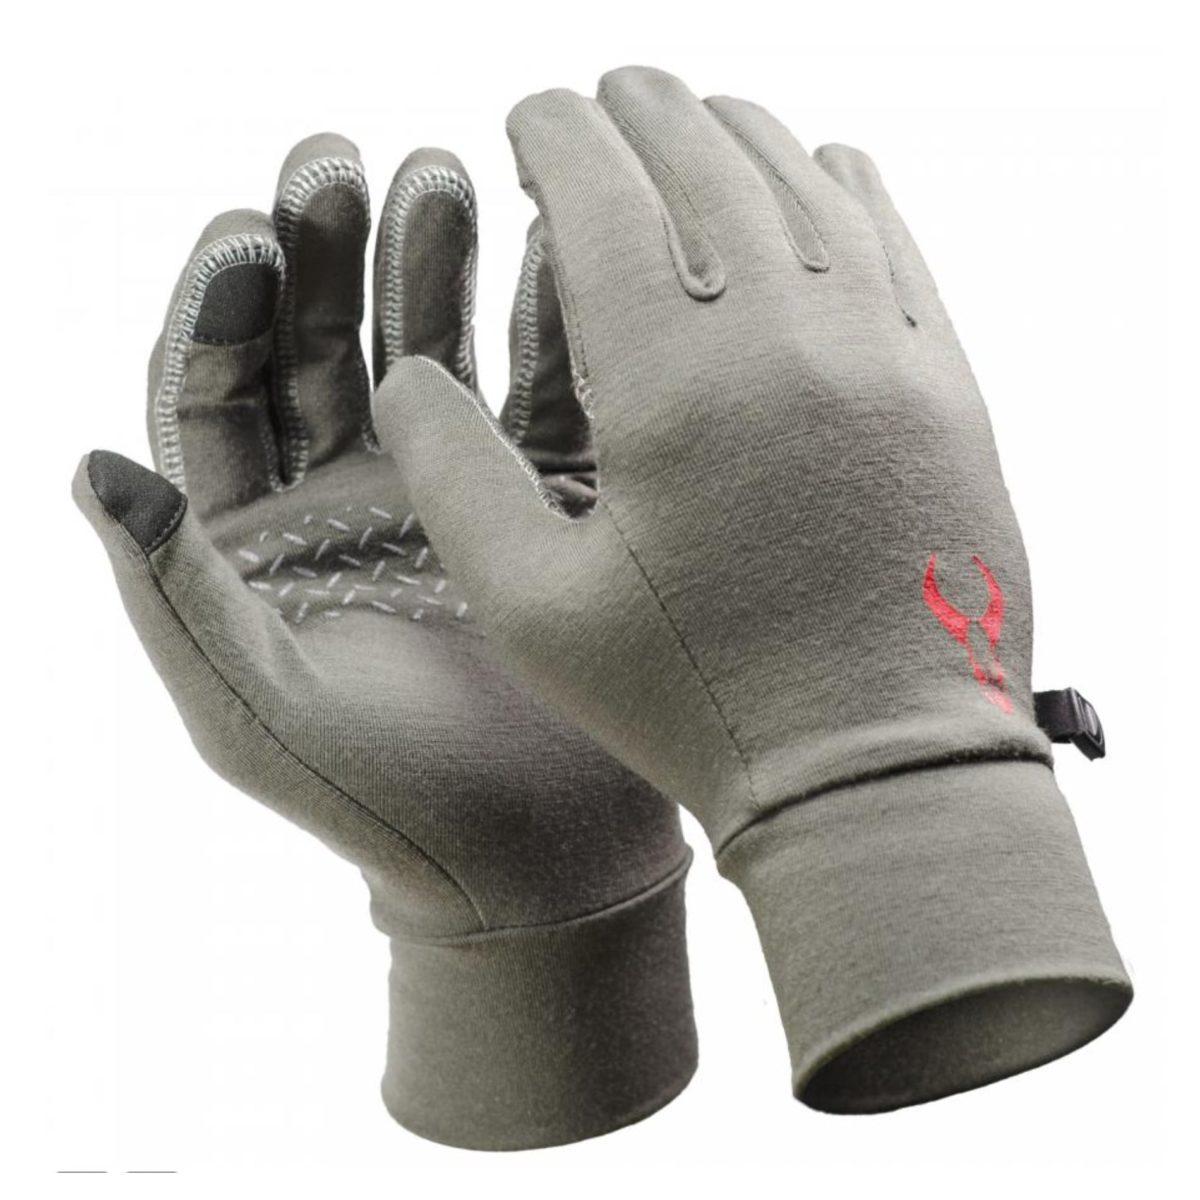 Badlands Merino Liner Gloves